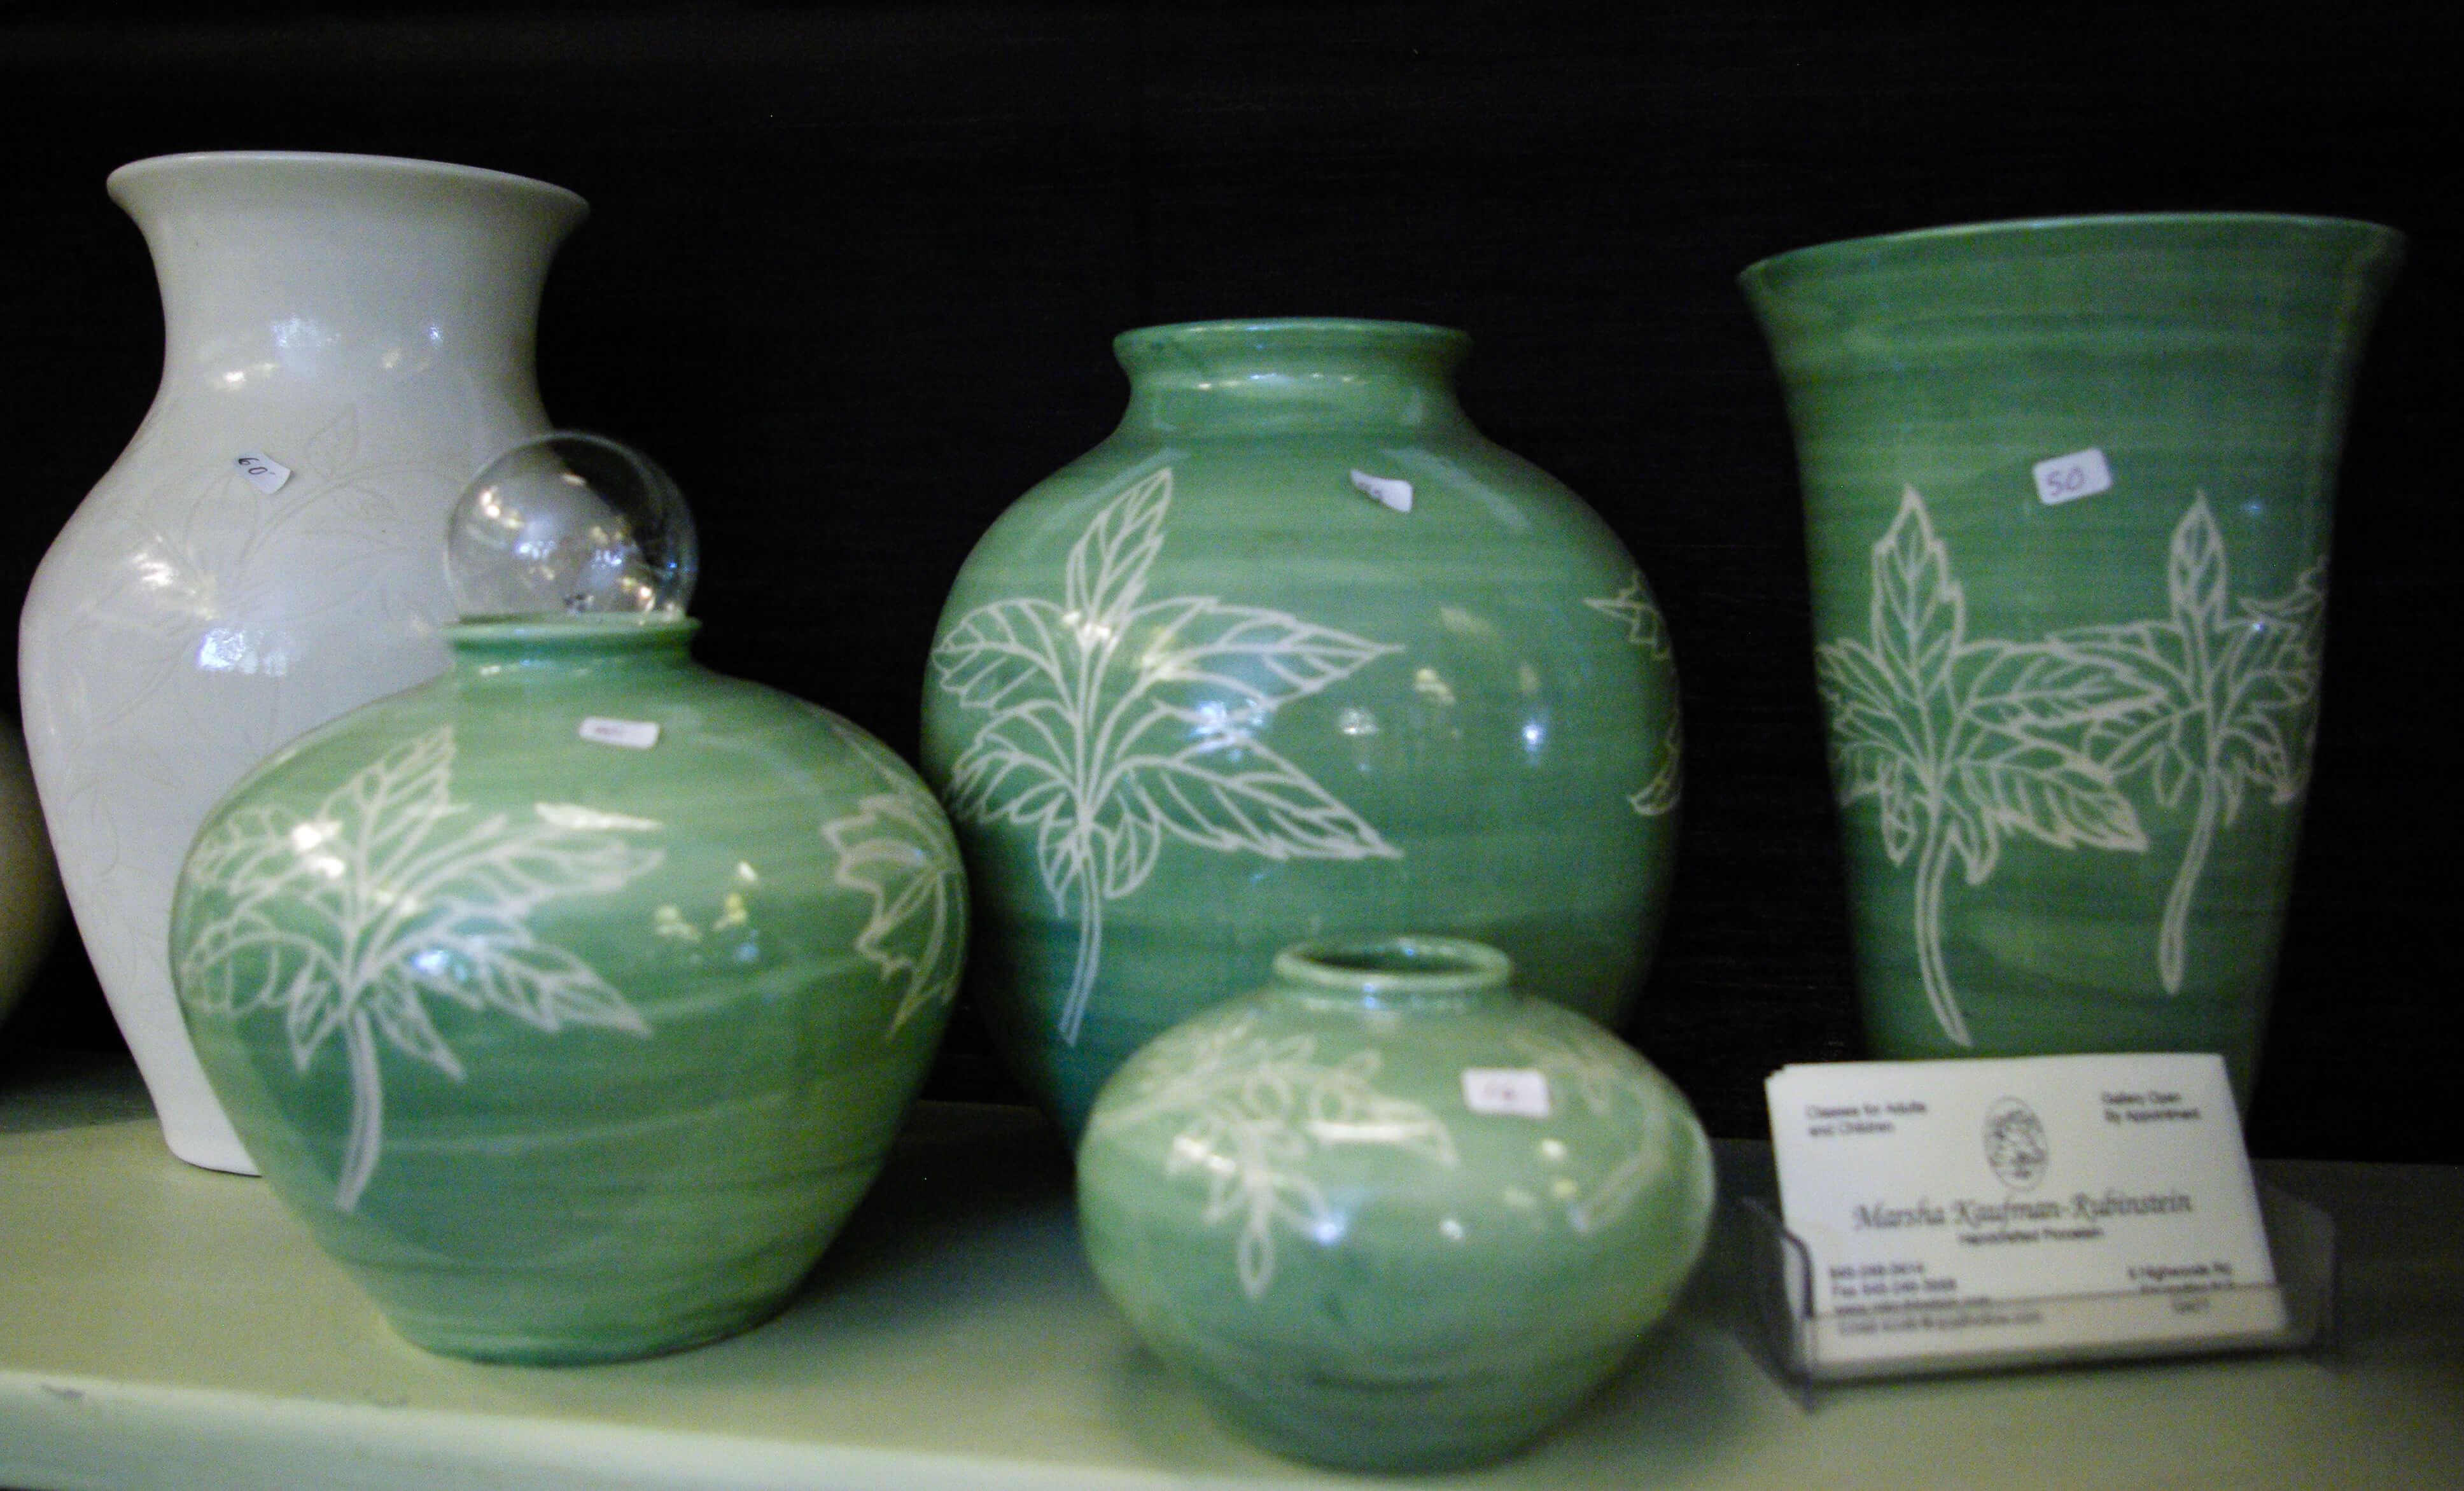 Marsha Kauffman Rubinstein, Porcelain Pottery, handmade ceramics